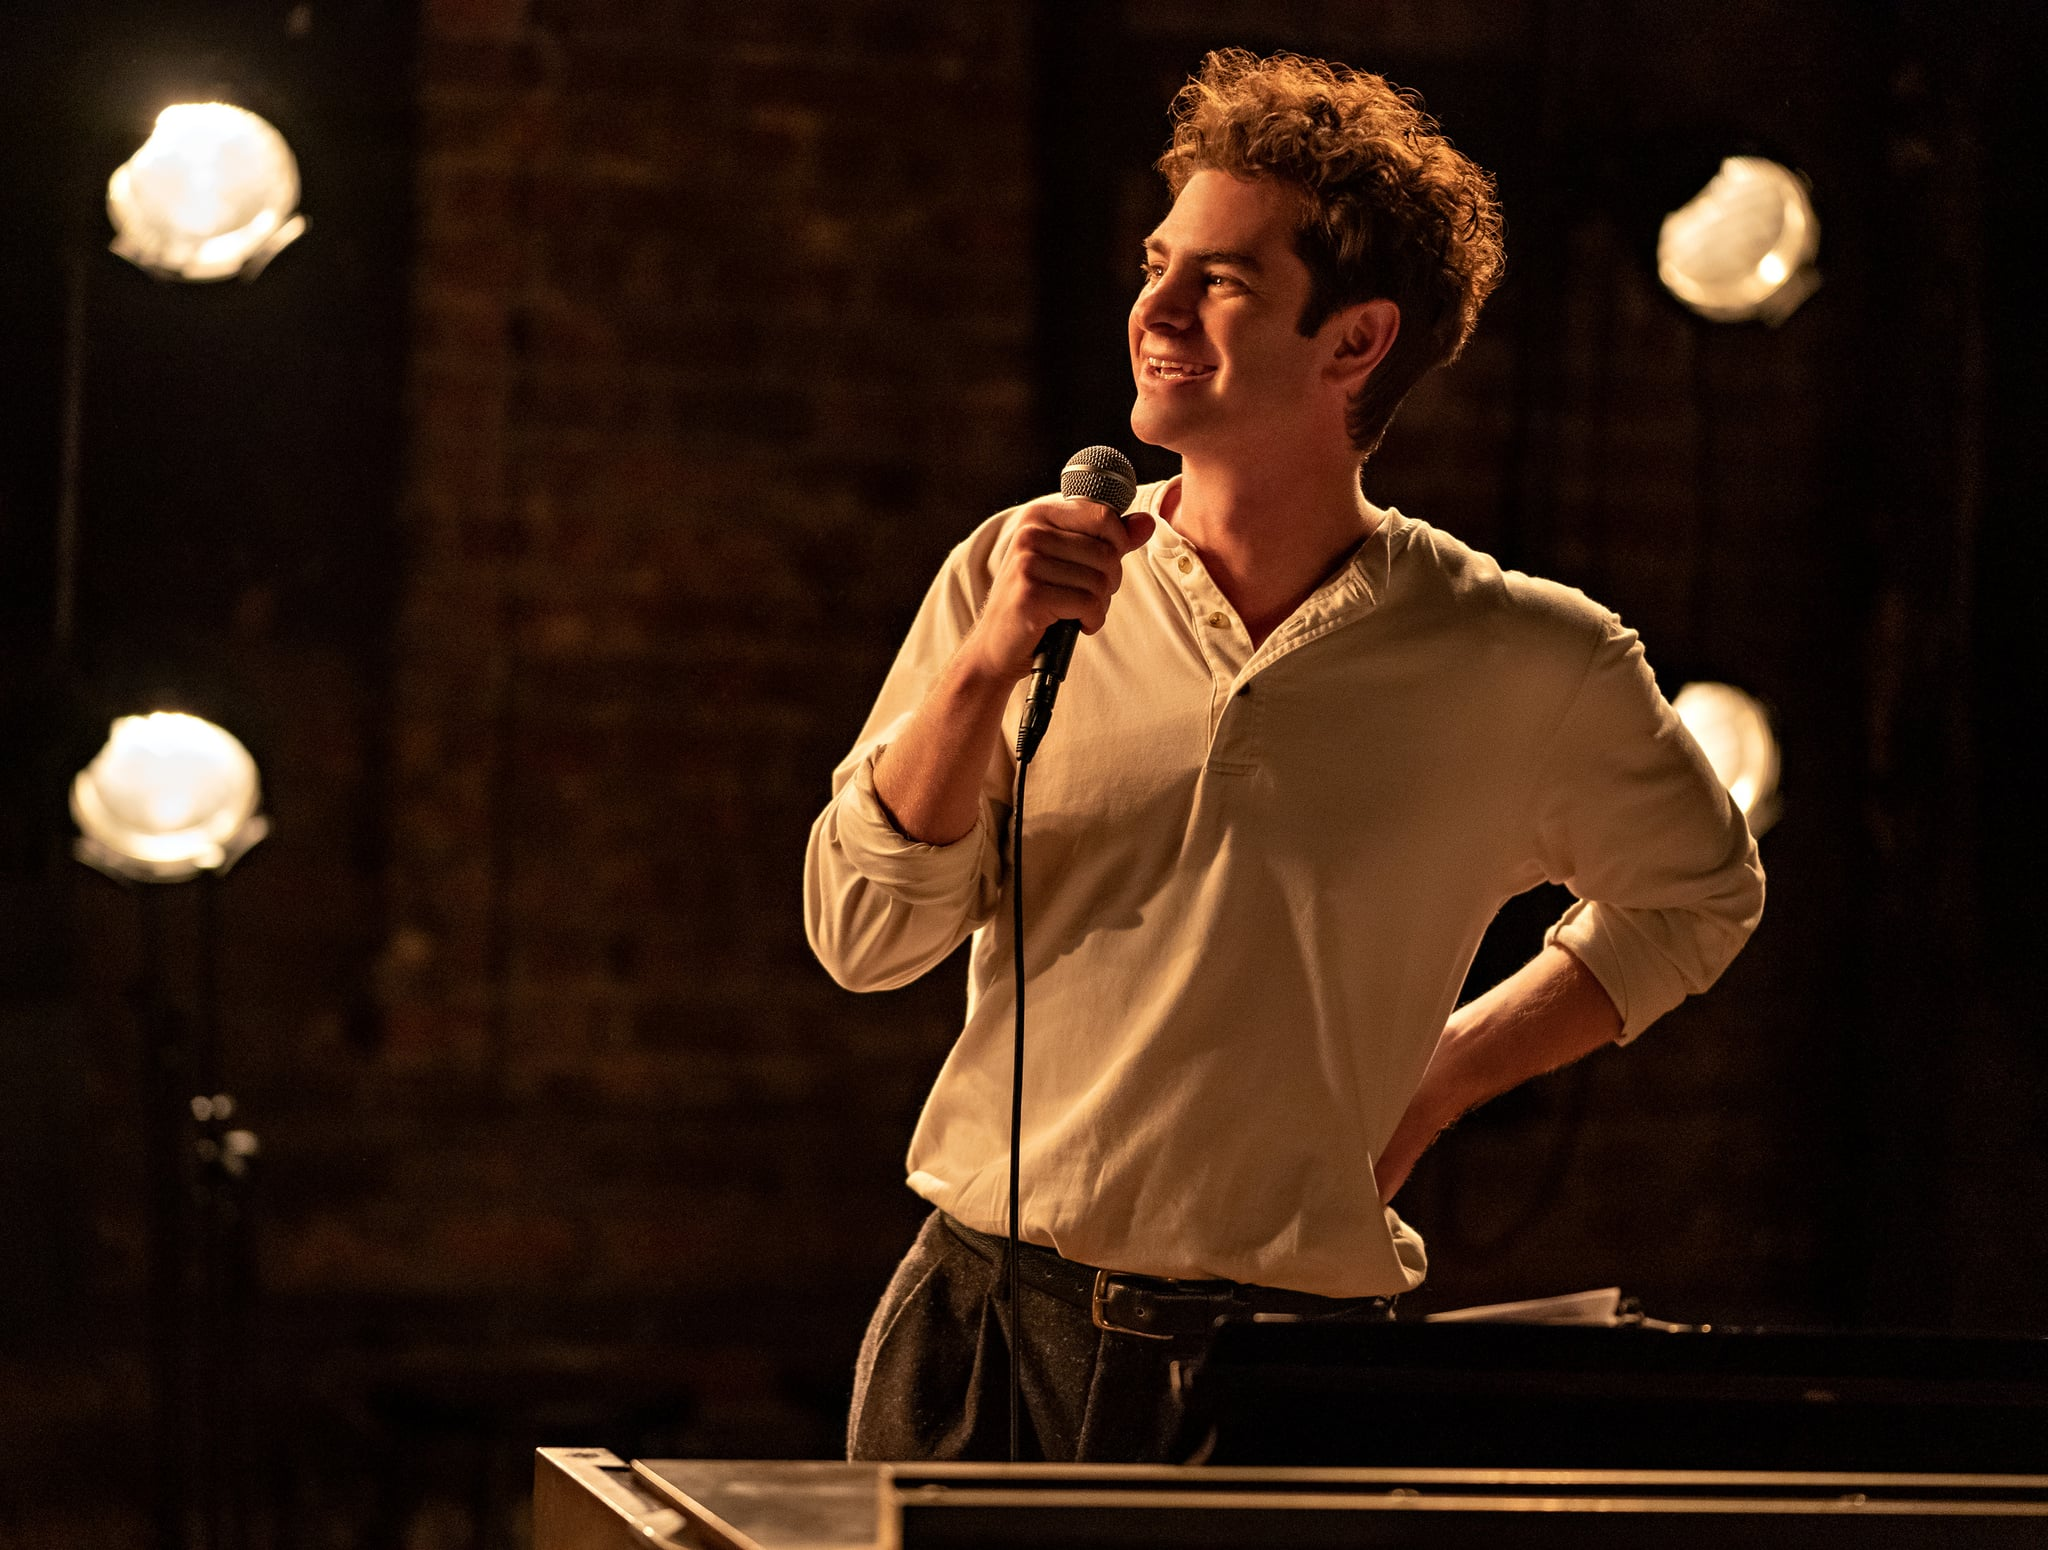 TICK, TICK…BOOM! Andrew Garfield as Jonathan Larson, in TICK, TICK…BOOM! Photo Credit: Macall Polay/NETFLIX ©2021